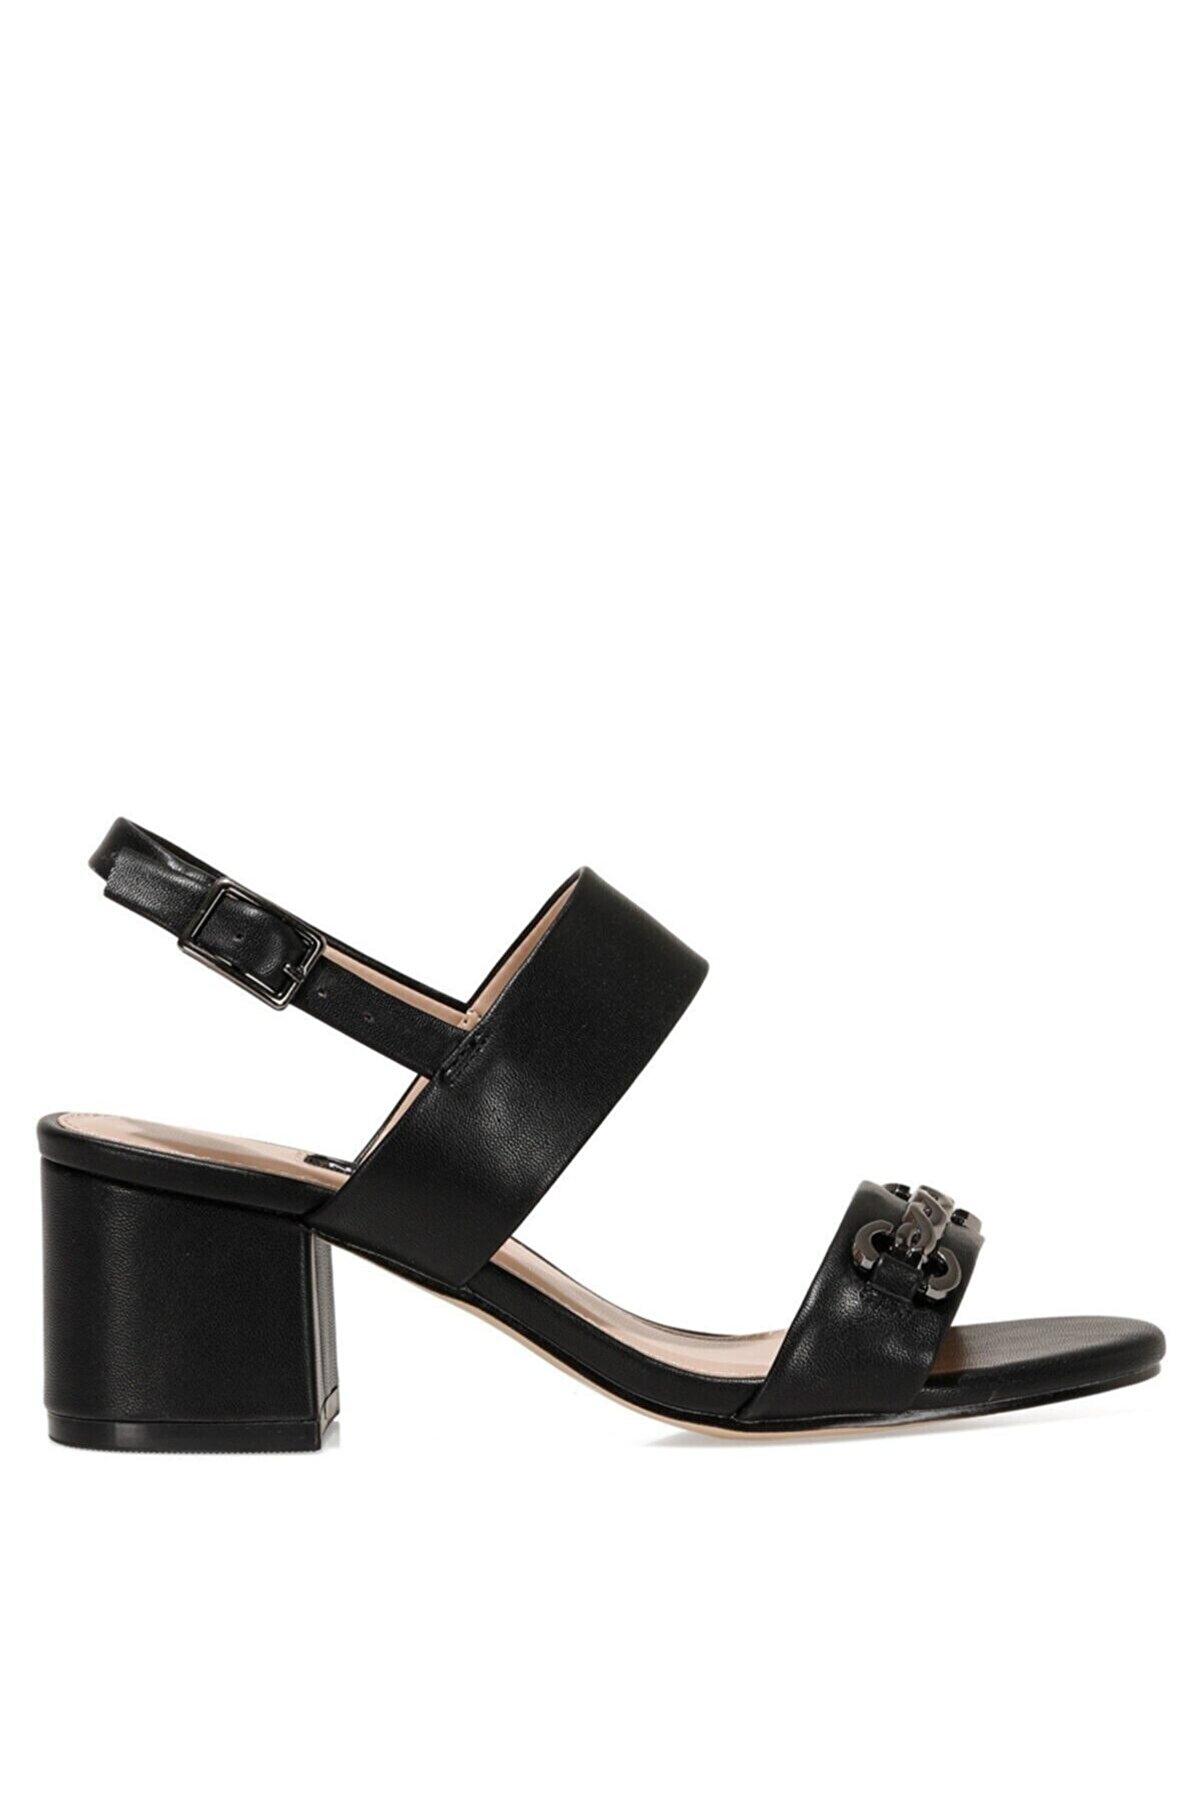 Nine West Samara 1fx Siyah Kadın Topuklu Sandalet